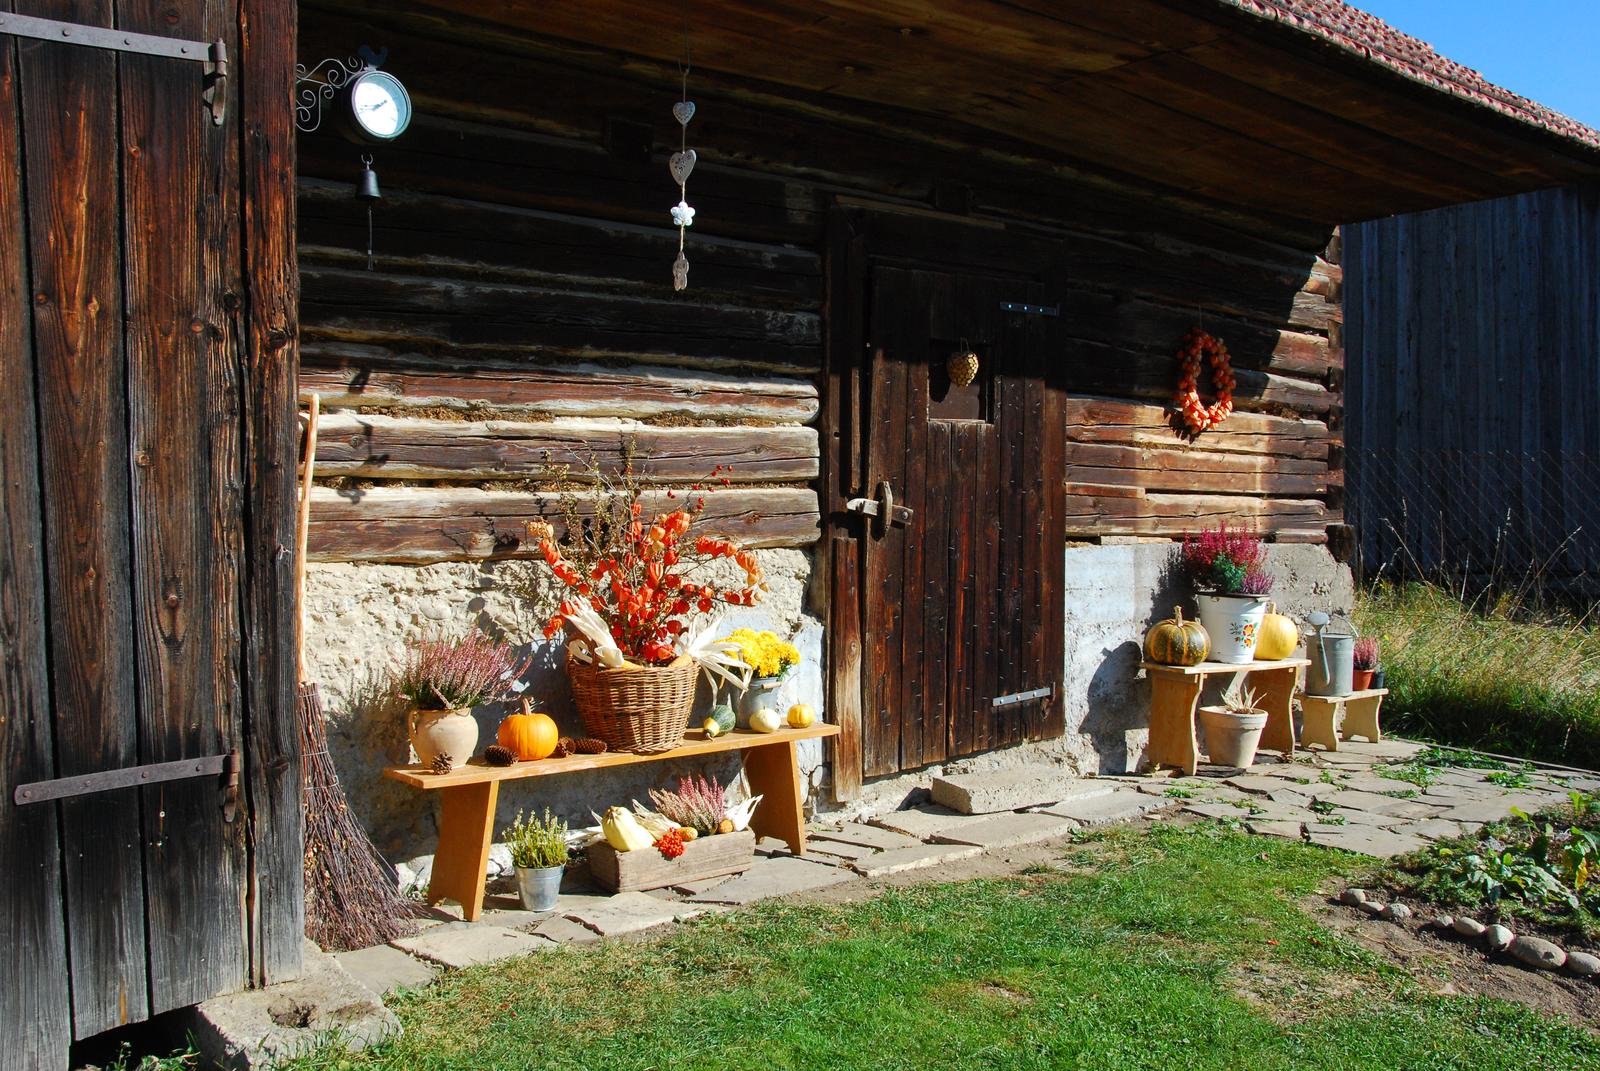 Jesen u nás doma - Obrázok č. 1